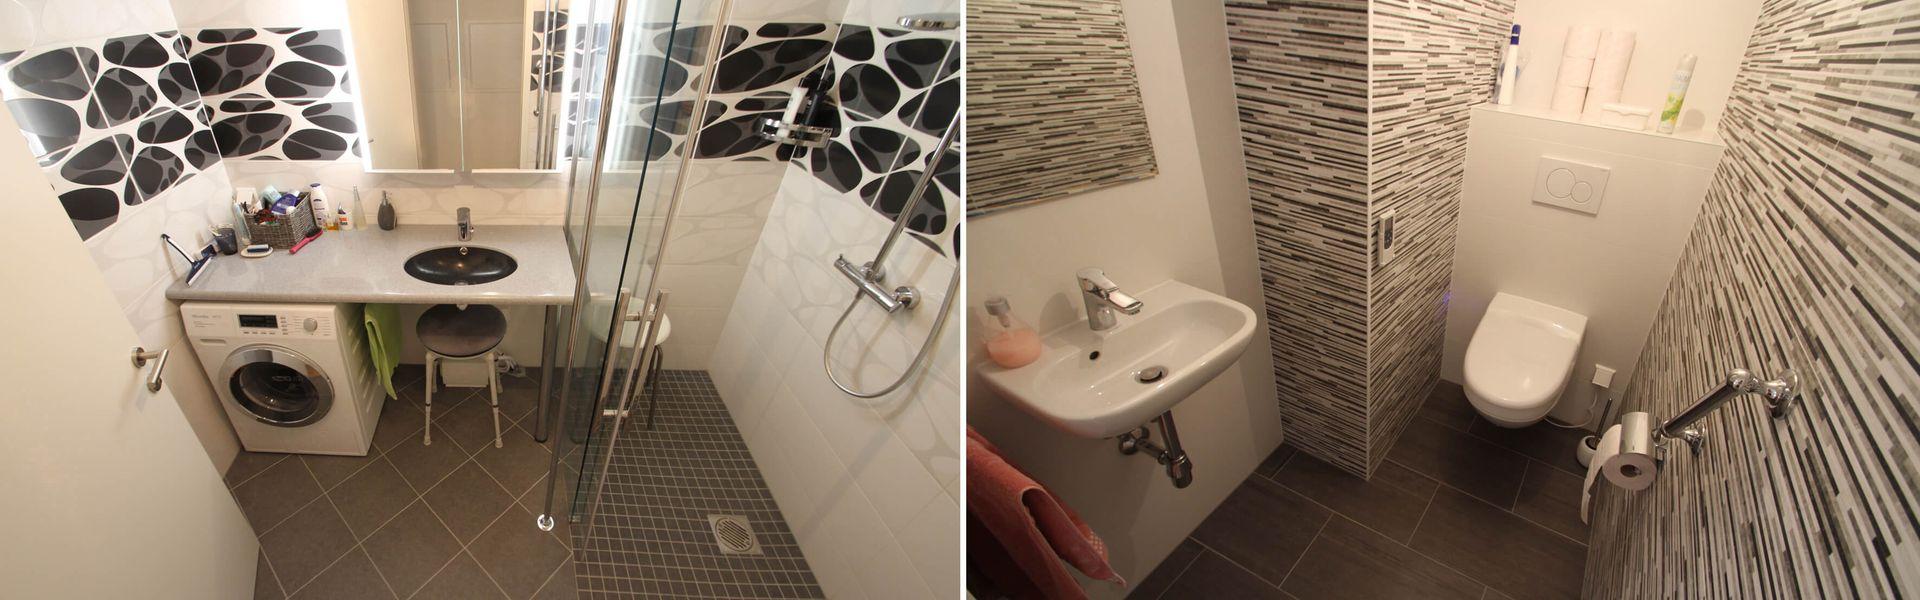 montage beigestellter ware marvan installateur. Black Bedroom Furniture Sets. Home Design Ideas